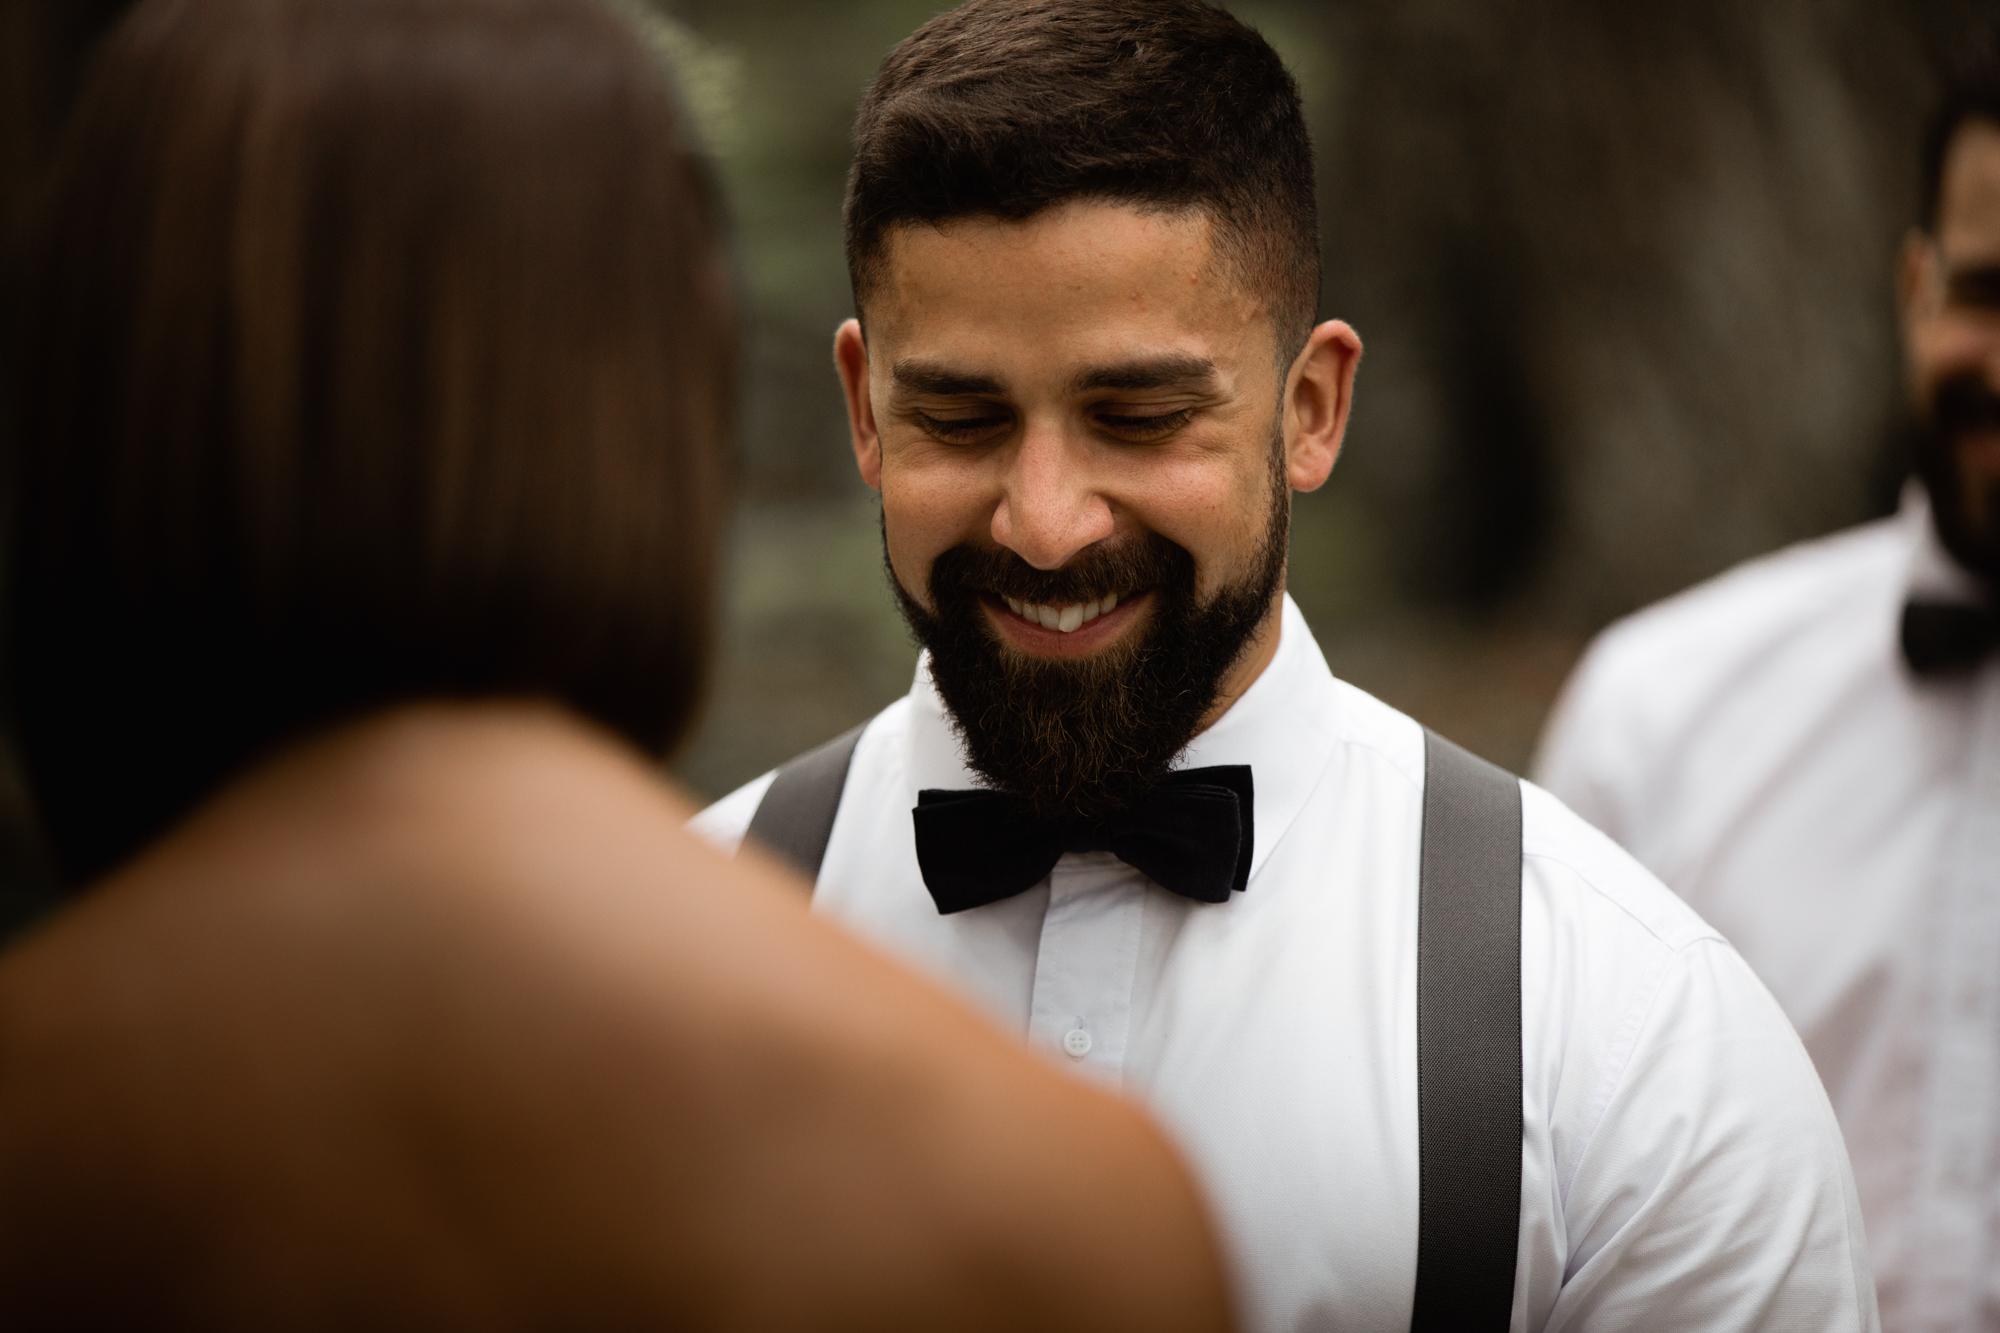 groom at elopement ceremony